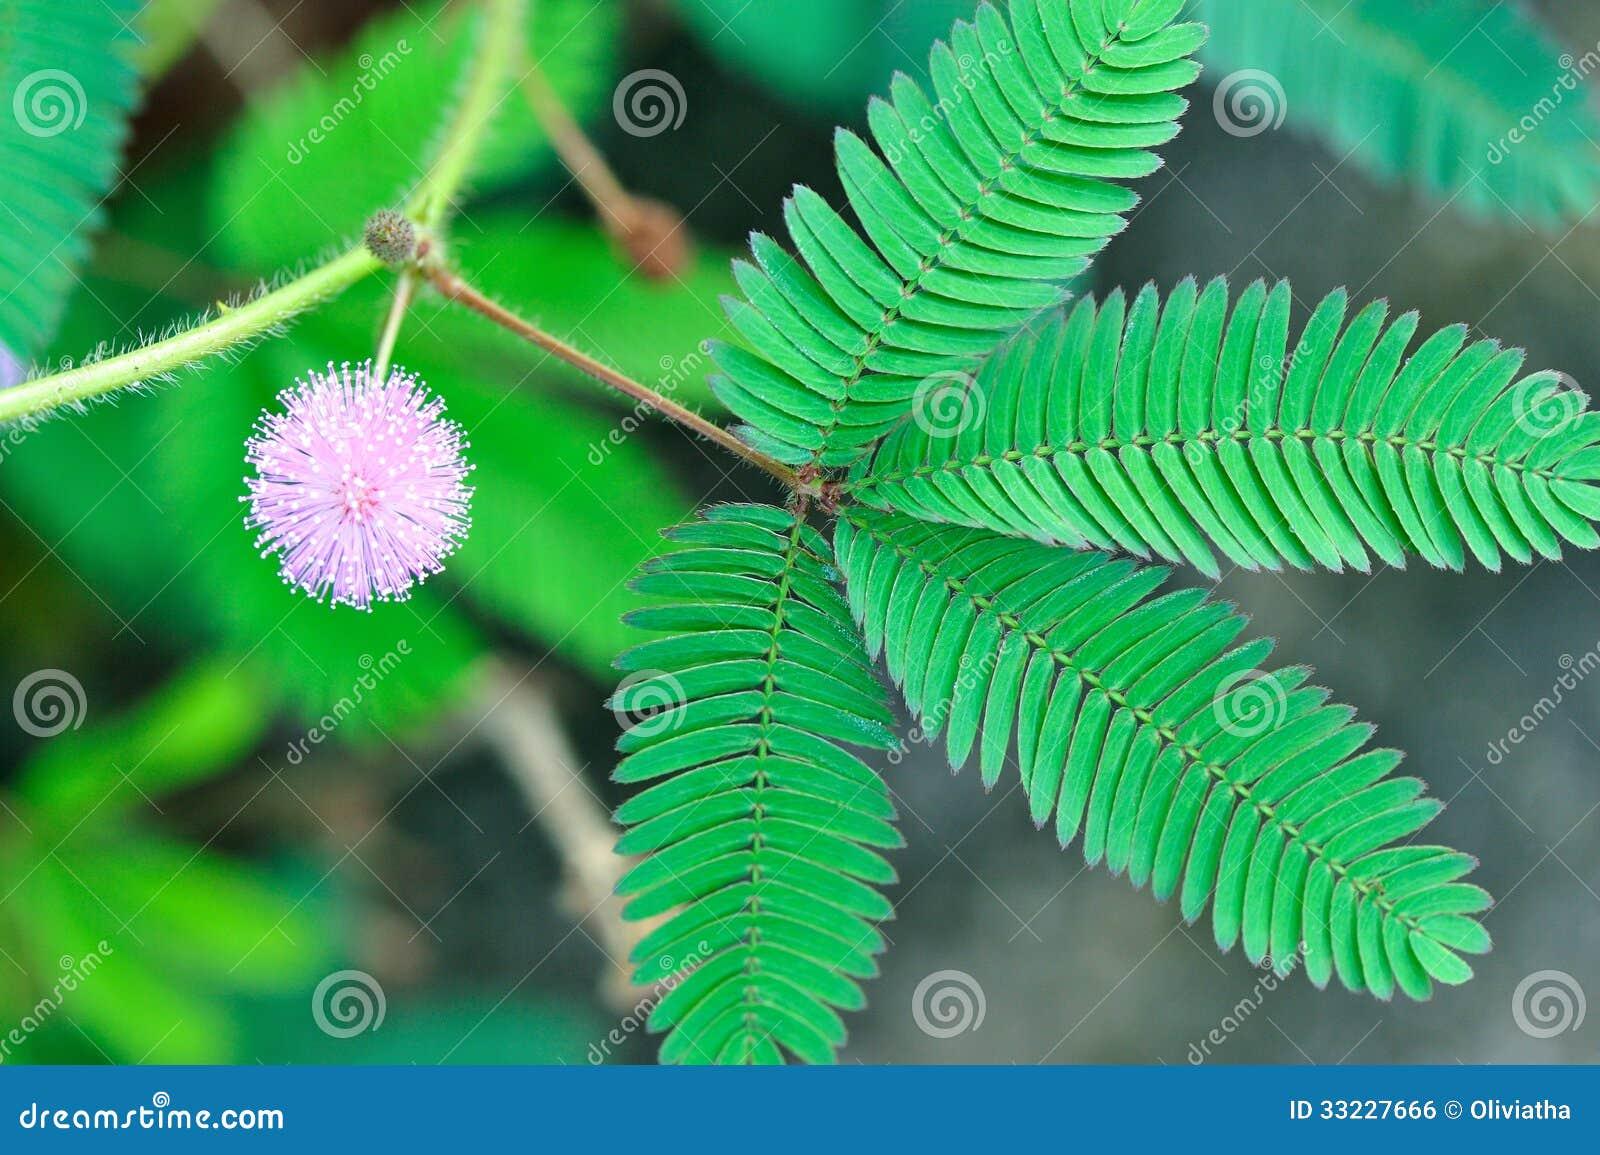 wilde blume pudica mimose stockfoto bild von grow laub 33227666. Black Bedroom Furniture Sets. Home Design Ideas